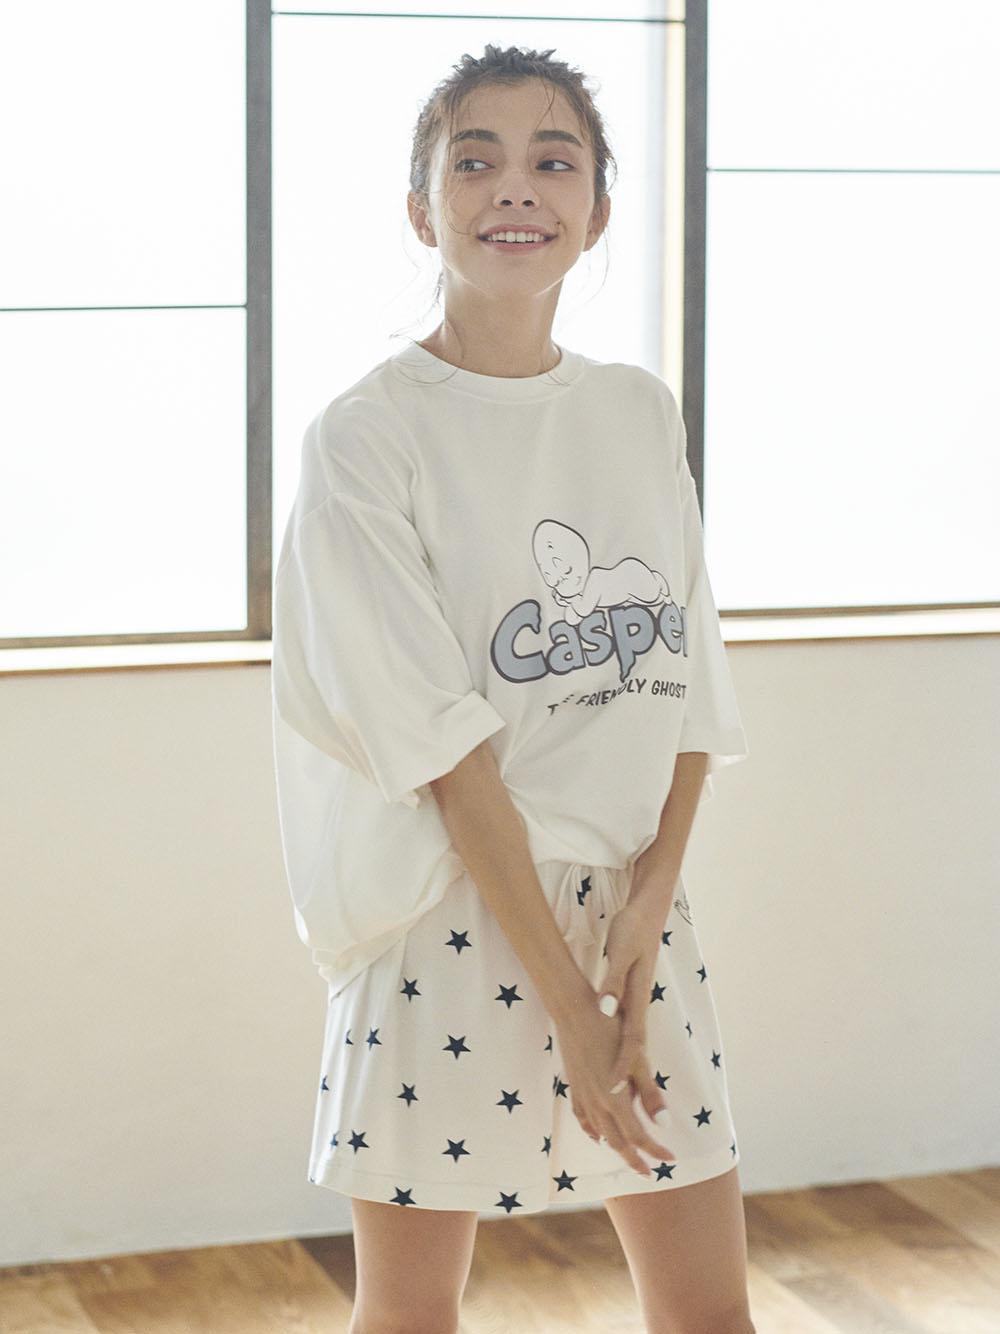 【CASPER】ワンポイントTシャツ | PWCT204331